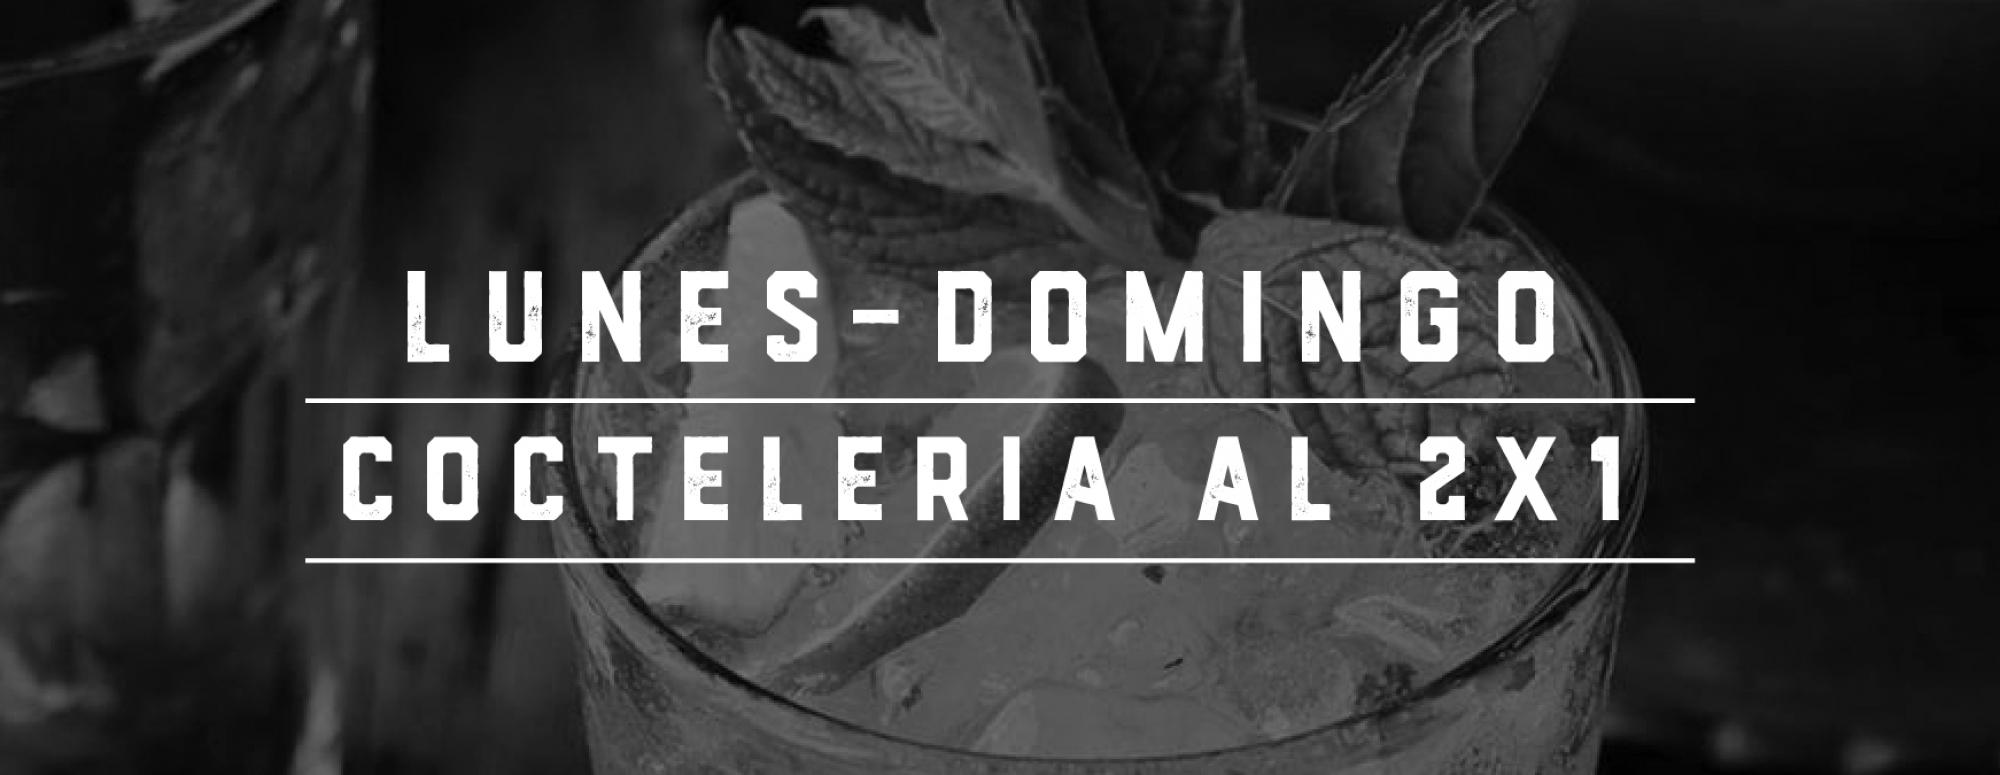 LUNES-DOMINGO-COCLETERIA